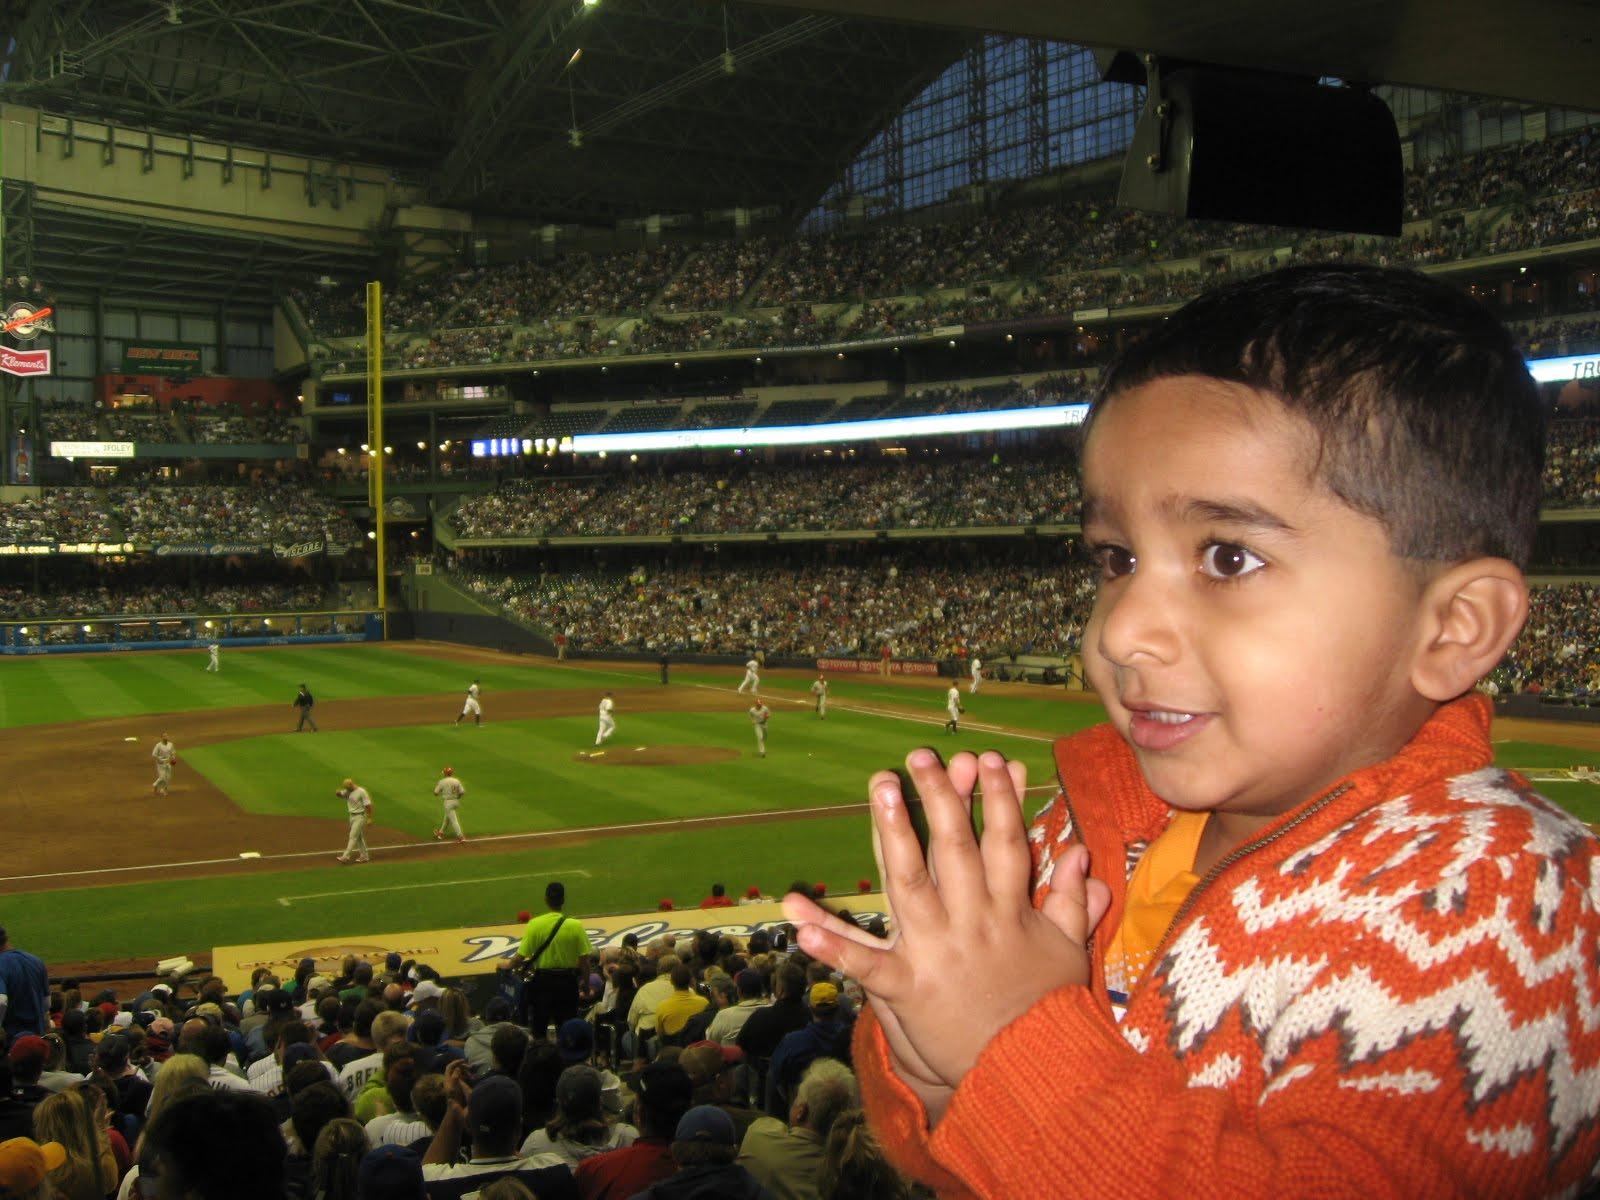 Milwaukee Brewers Bedroom In A Box Major League Baseball: Rohan's Blog